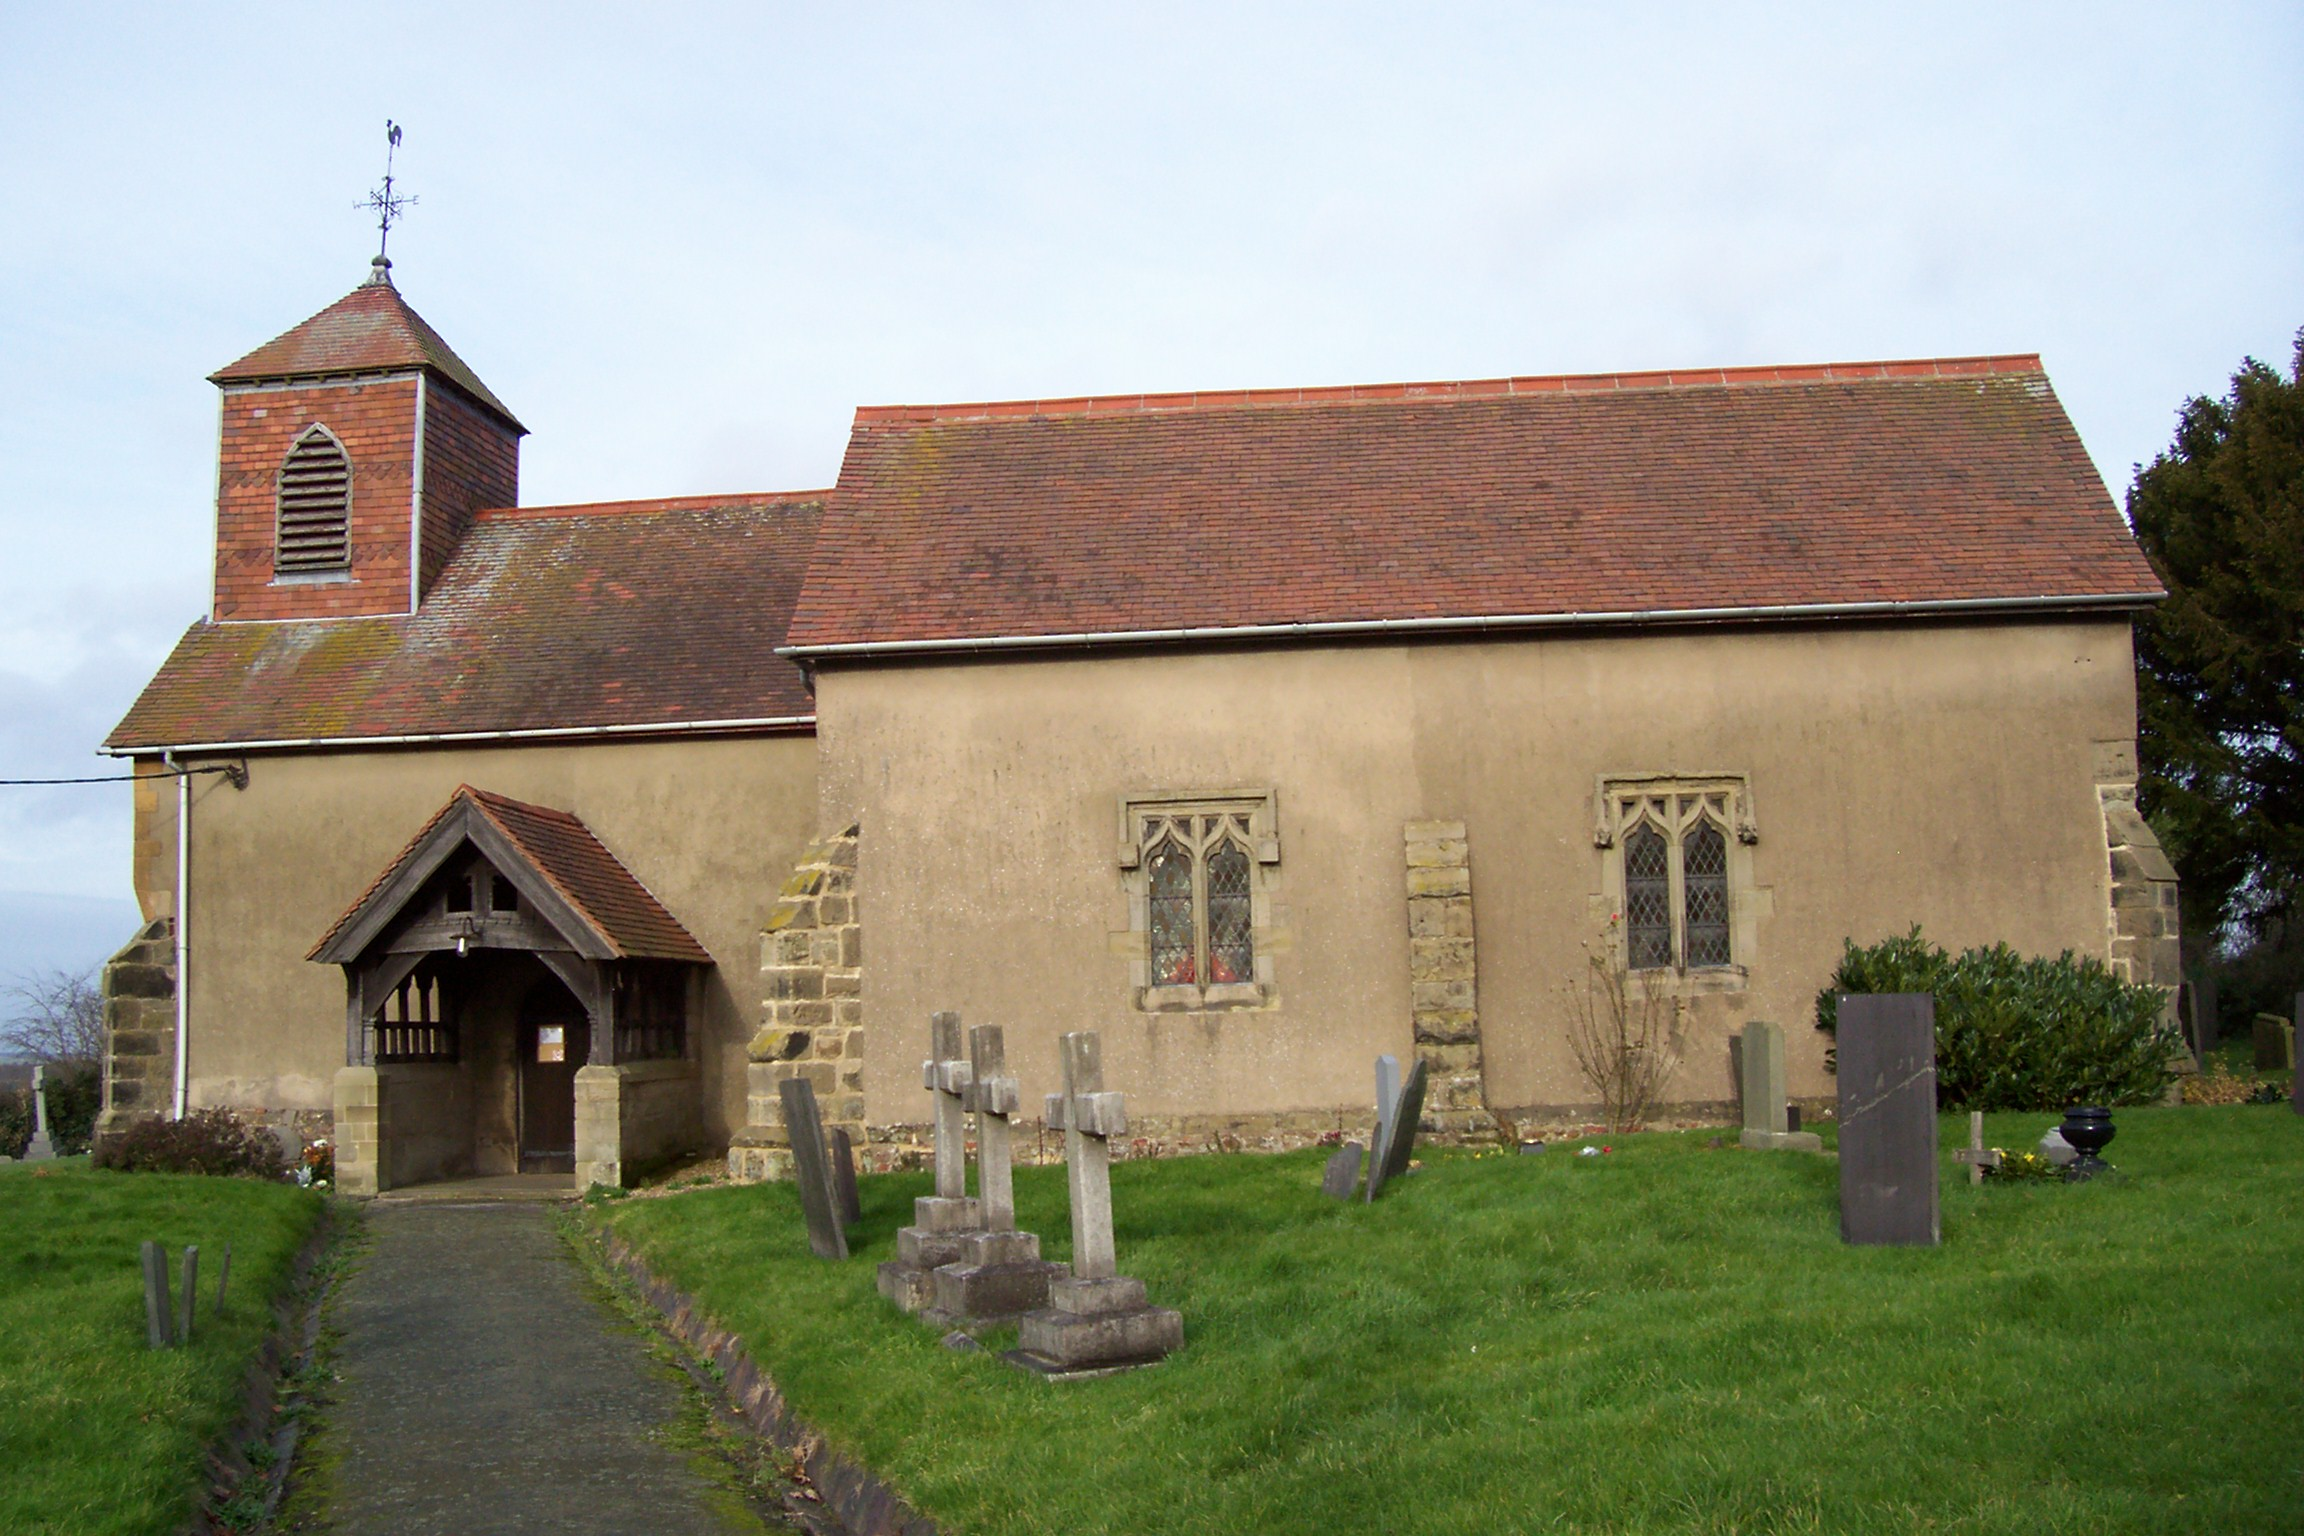 St. James the Greater, Dadlington